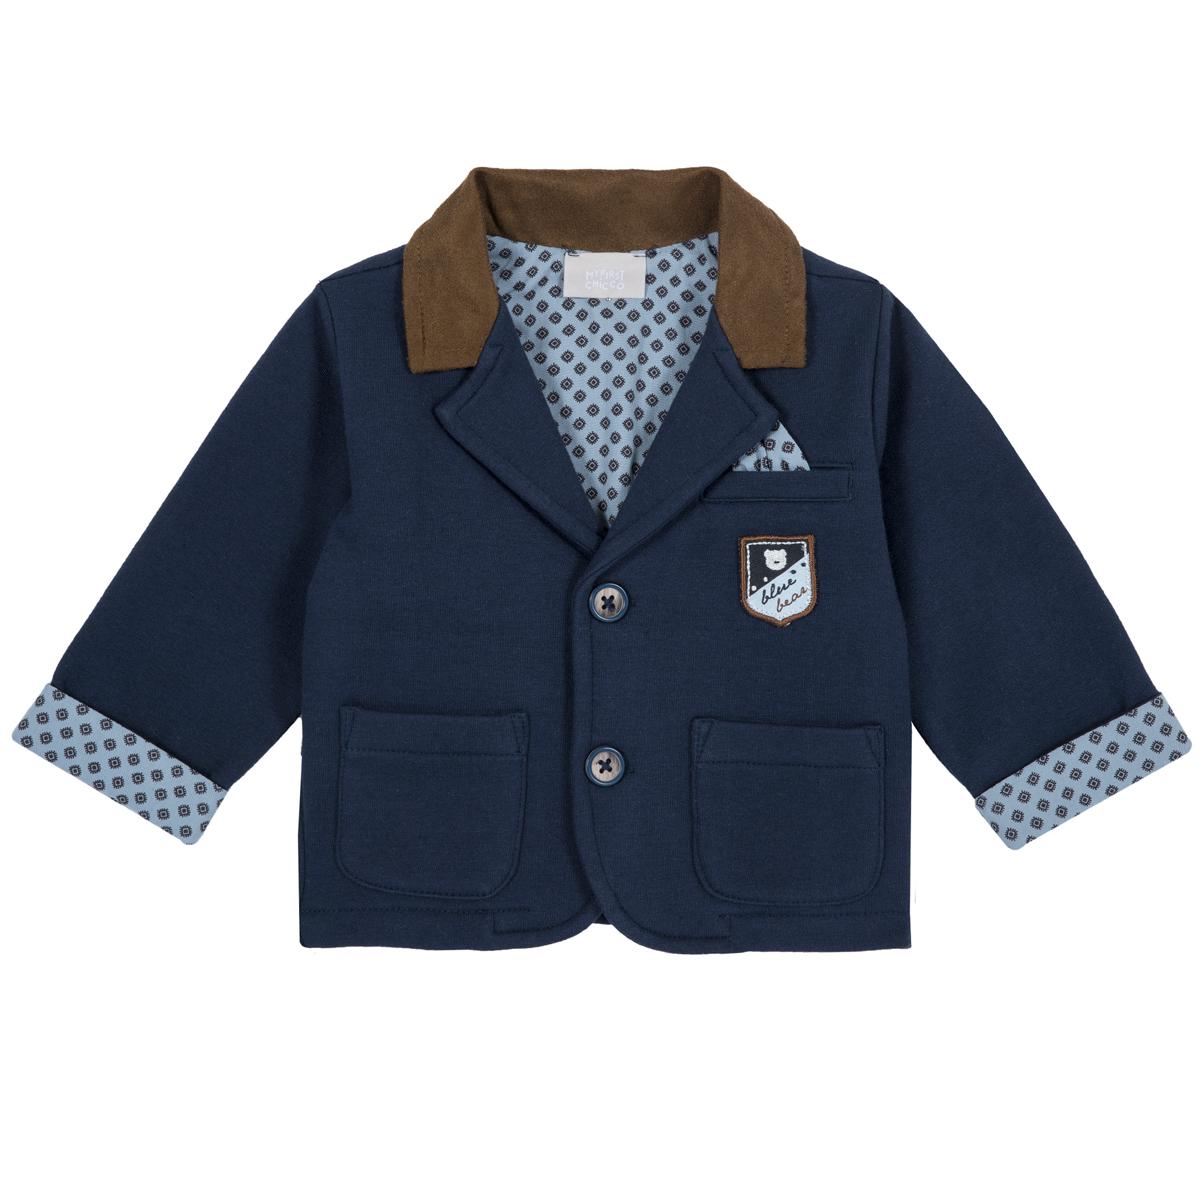 Jacheta copii Chicco, tip sacou, 84341 din categoria Jachete copii